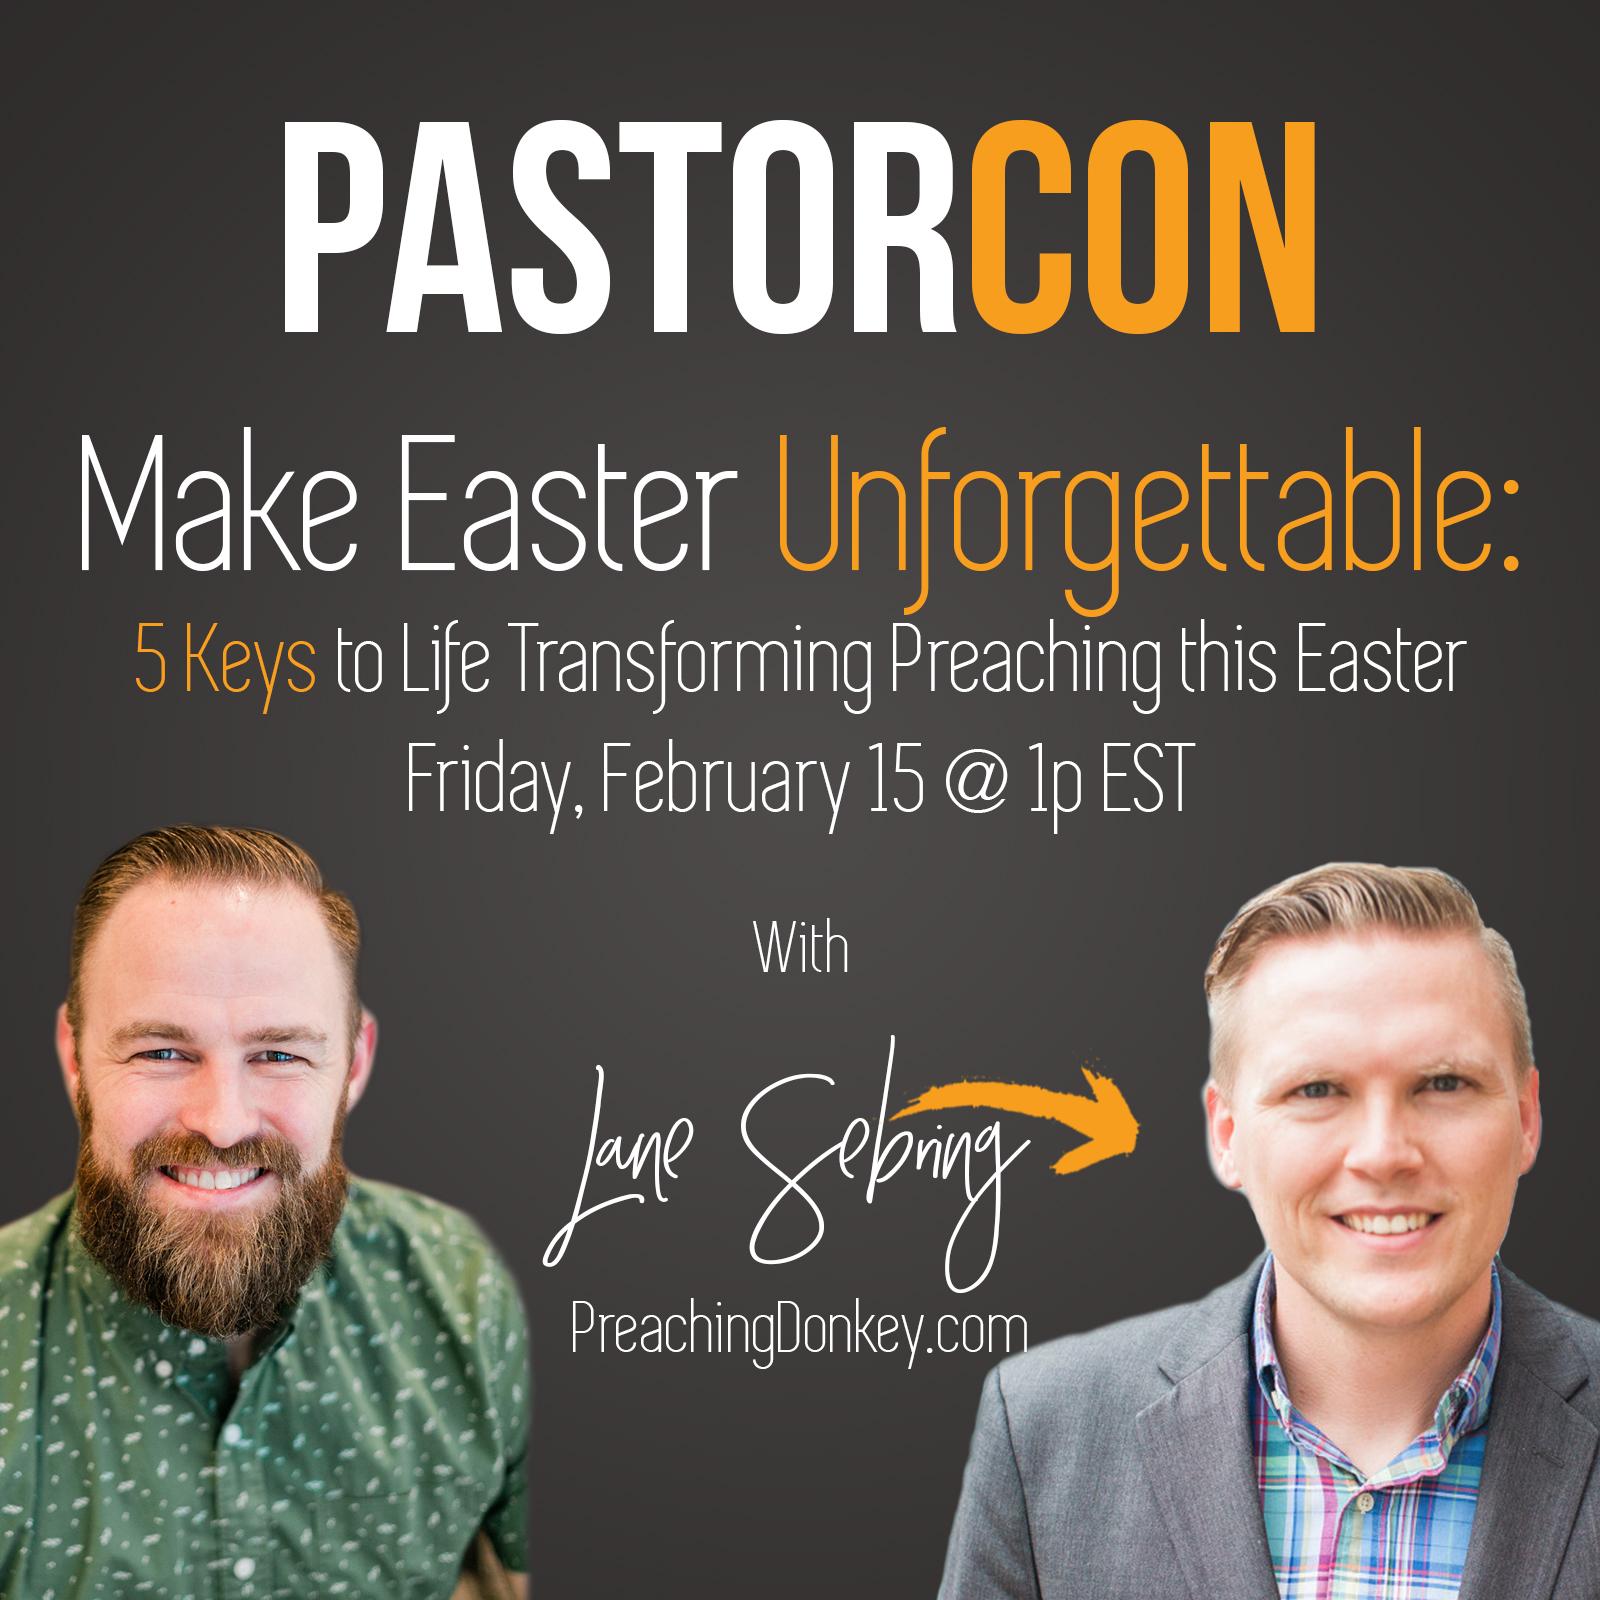 Pastor Con_easter preaching.jpg